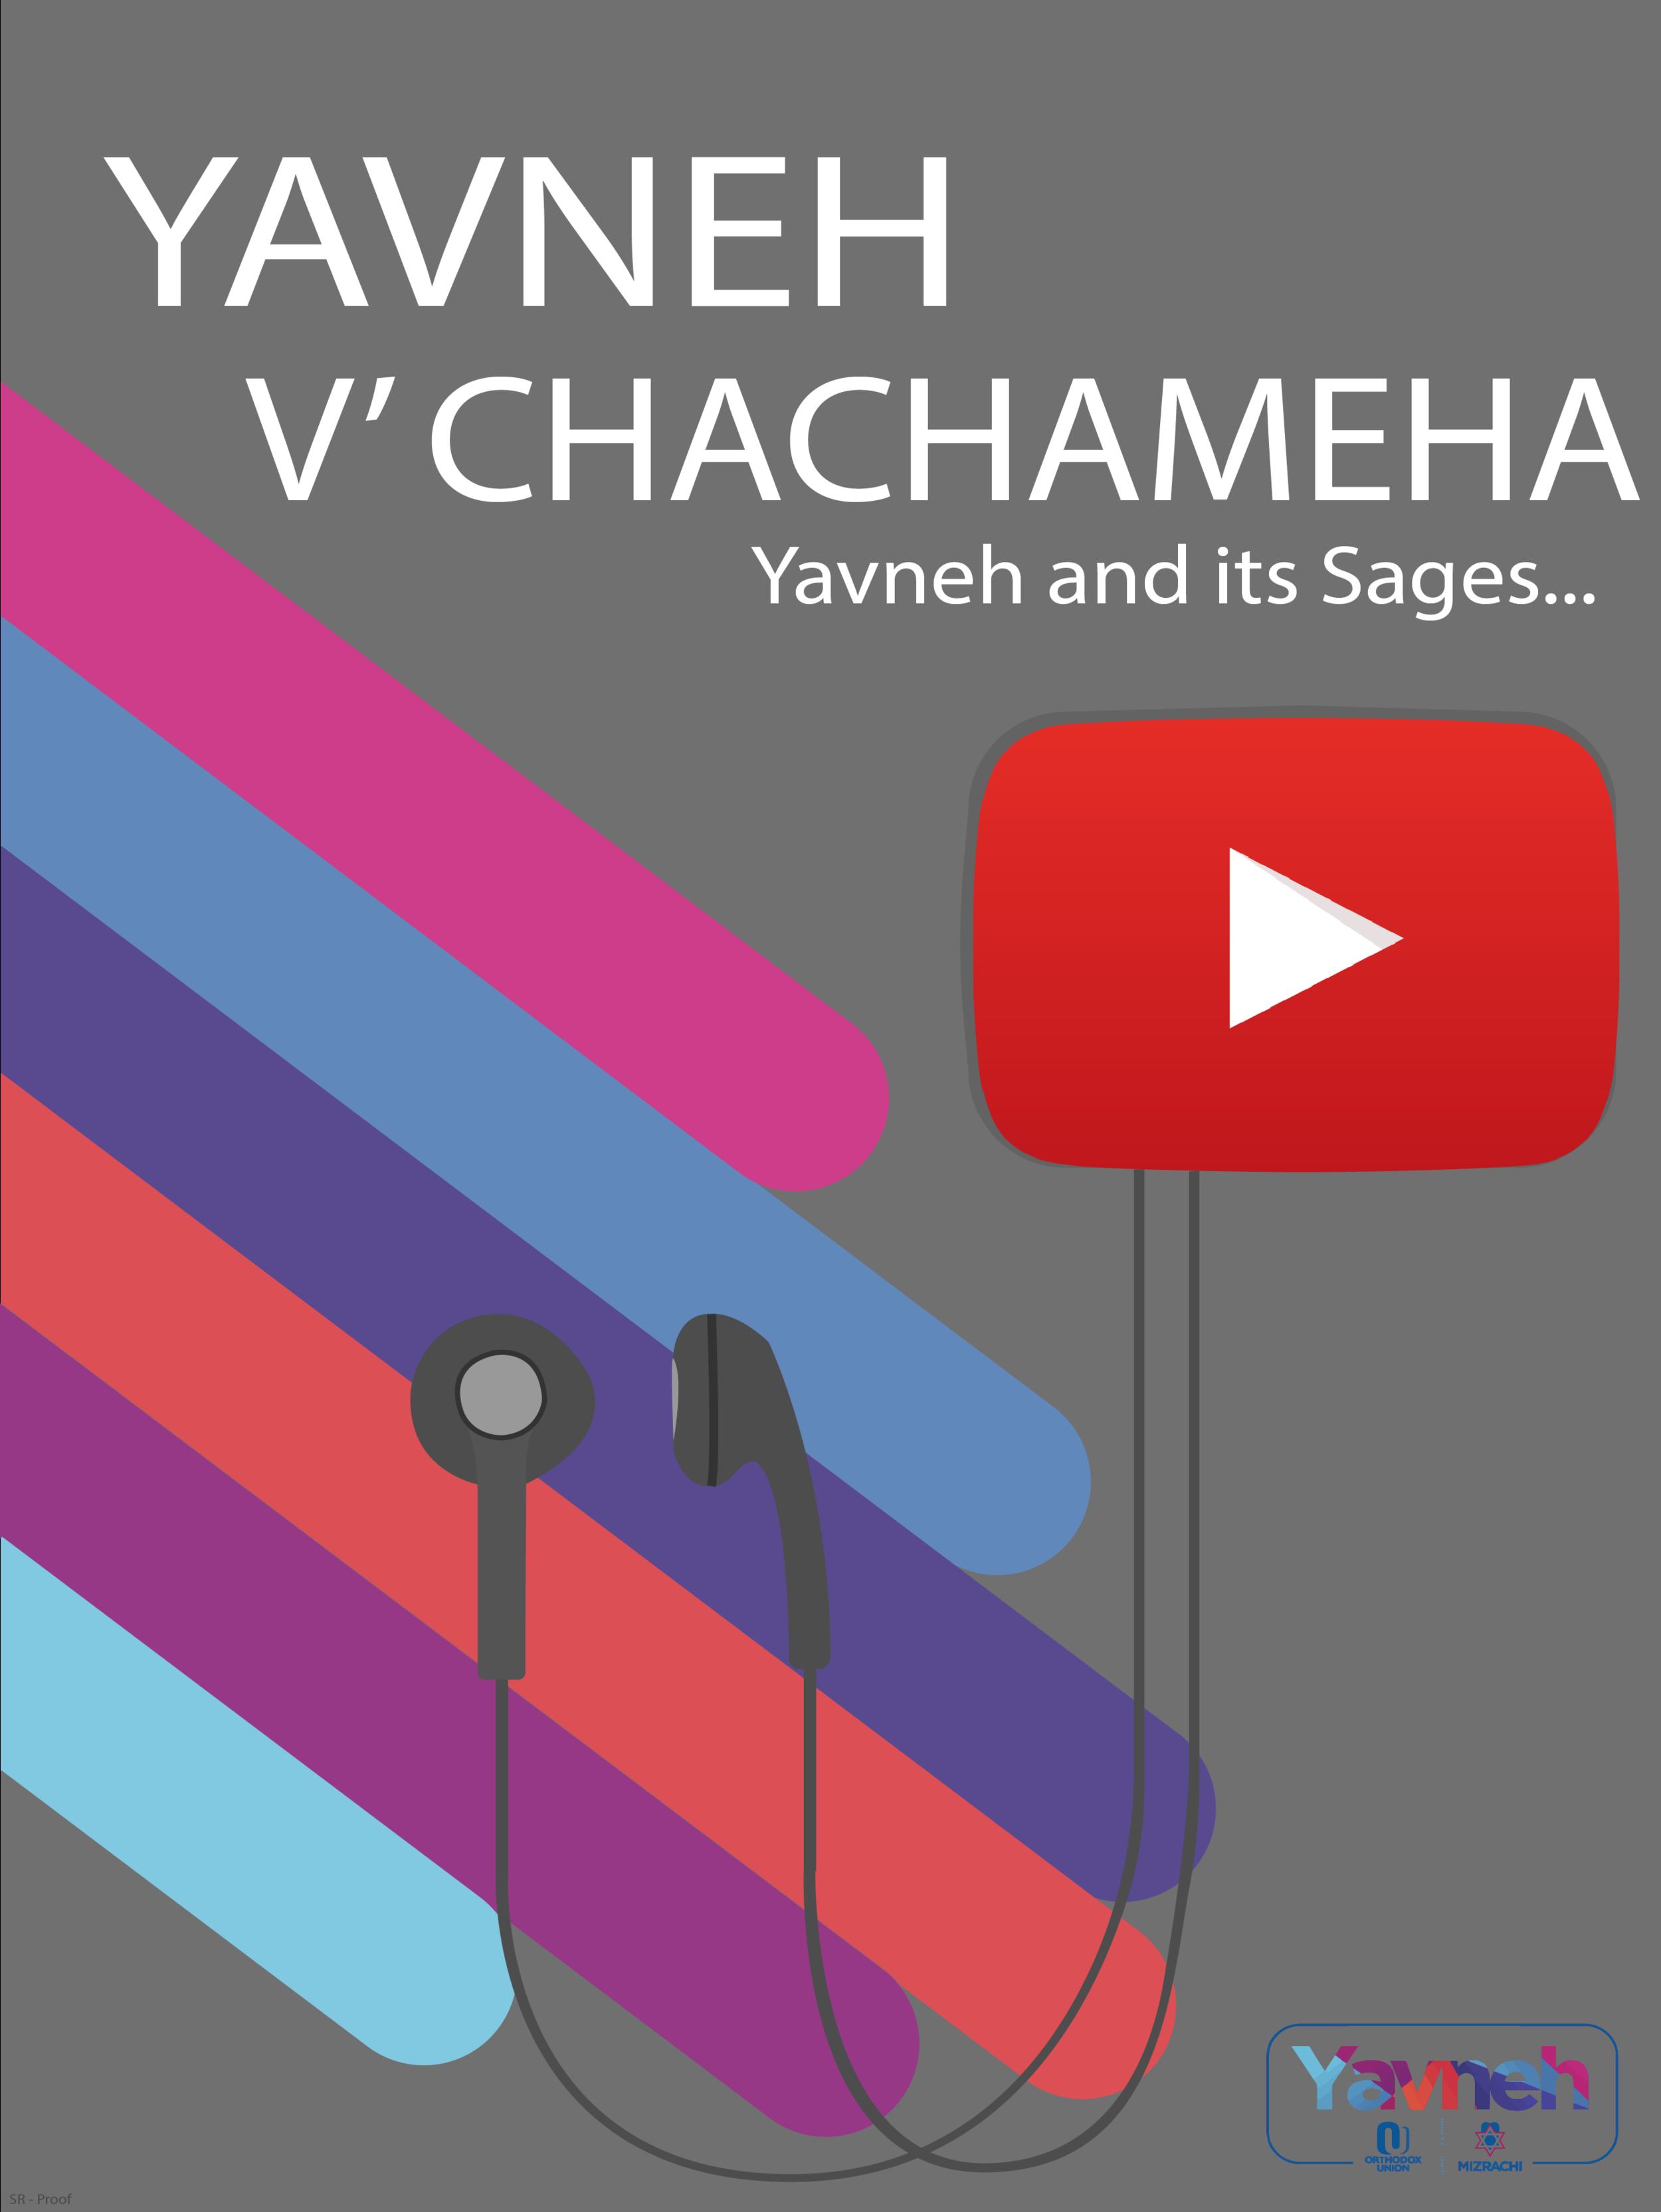 Yavneh VChachameha.png